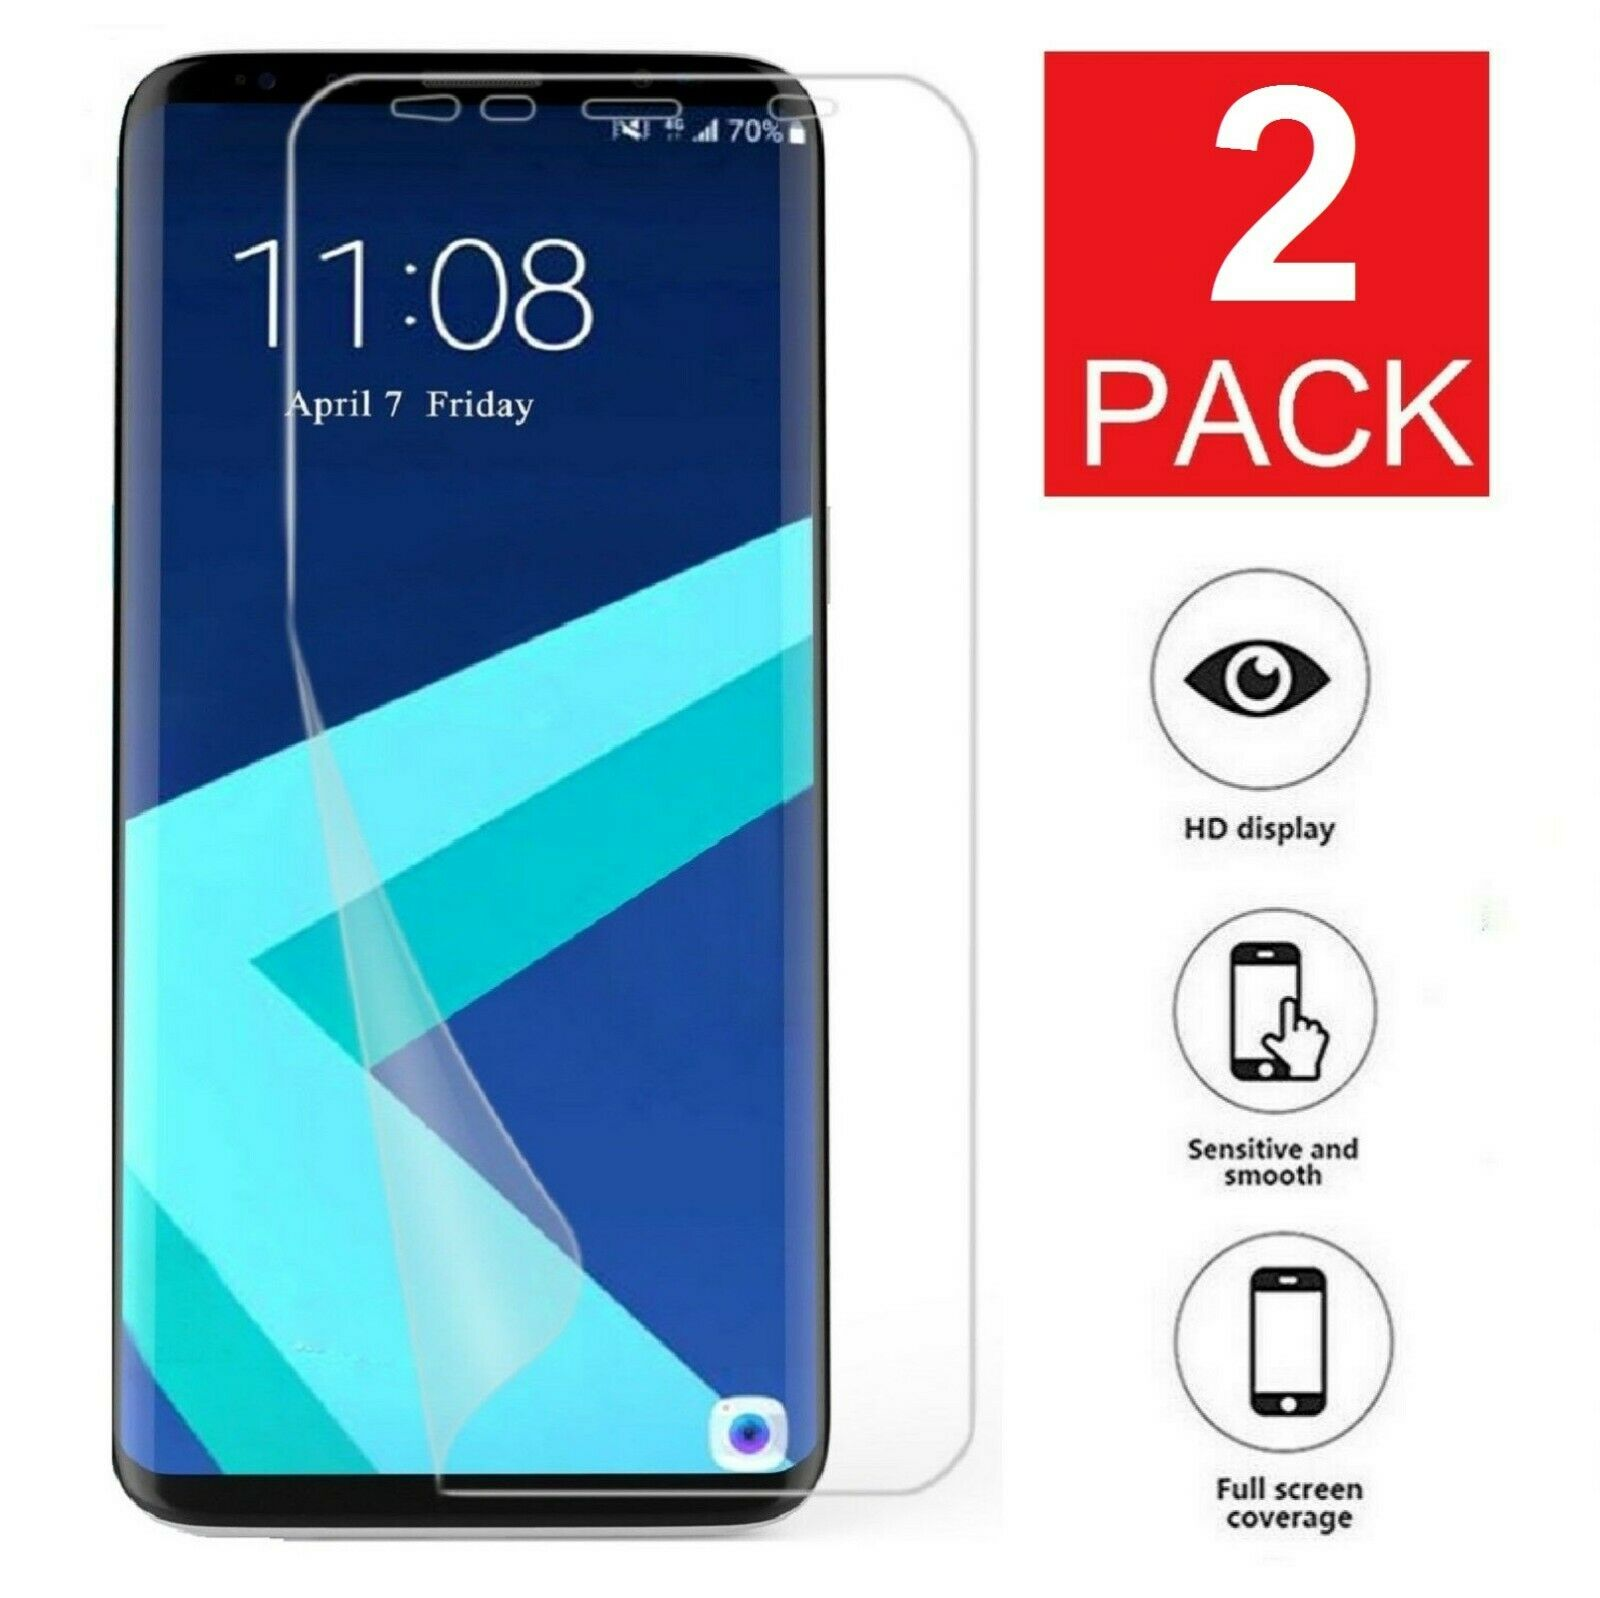 2-Pack Galaxy S8 S9 S10 Plus 10e 5G Note 8 9 Film Screen Pro